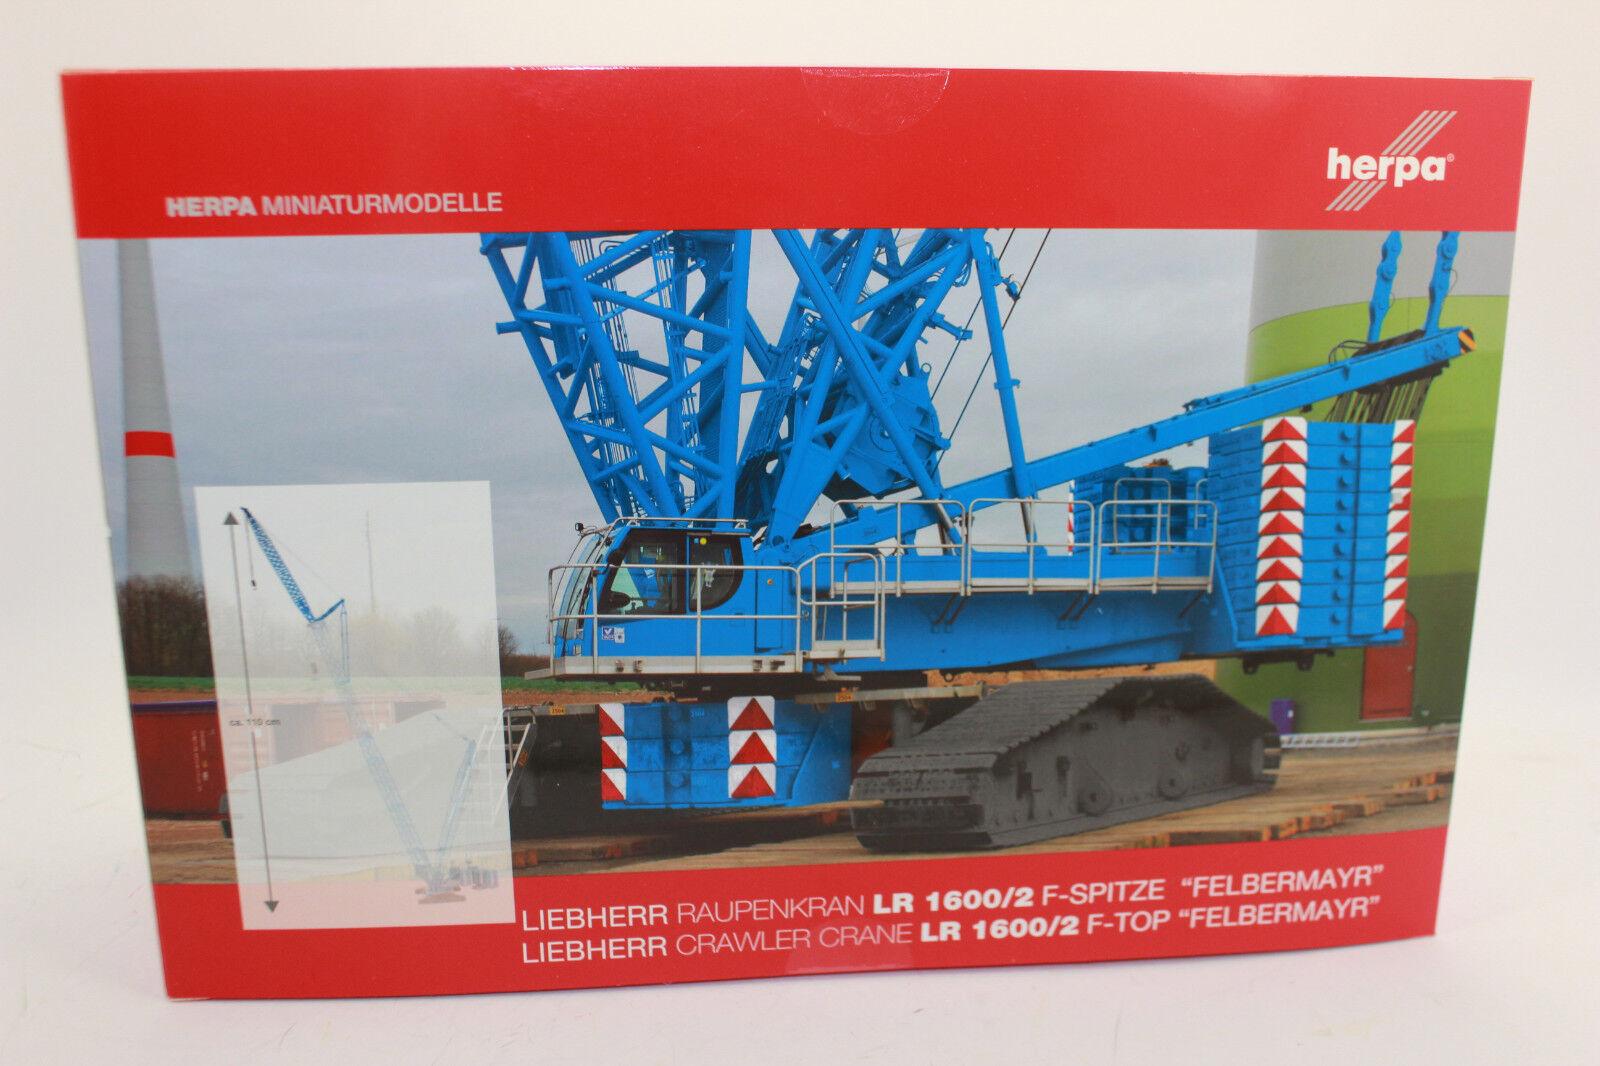 Herpa 308298 f-spitze PER Liebherr Gru cingolata LR 1600/2 Felbermayr 1:87 H0